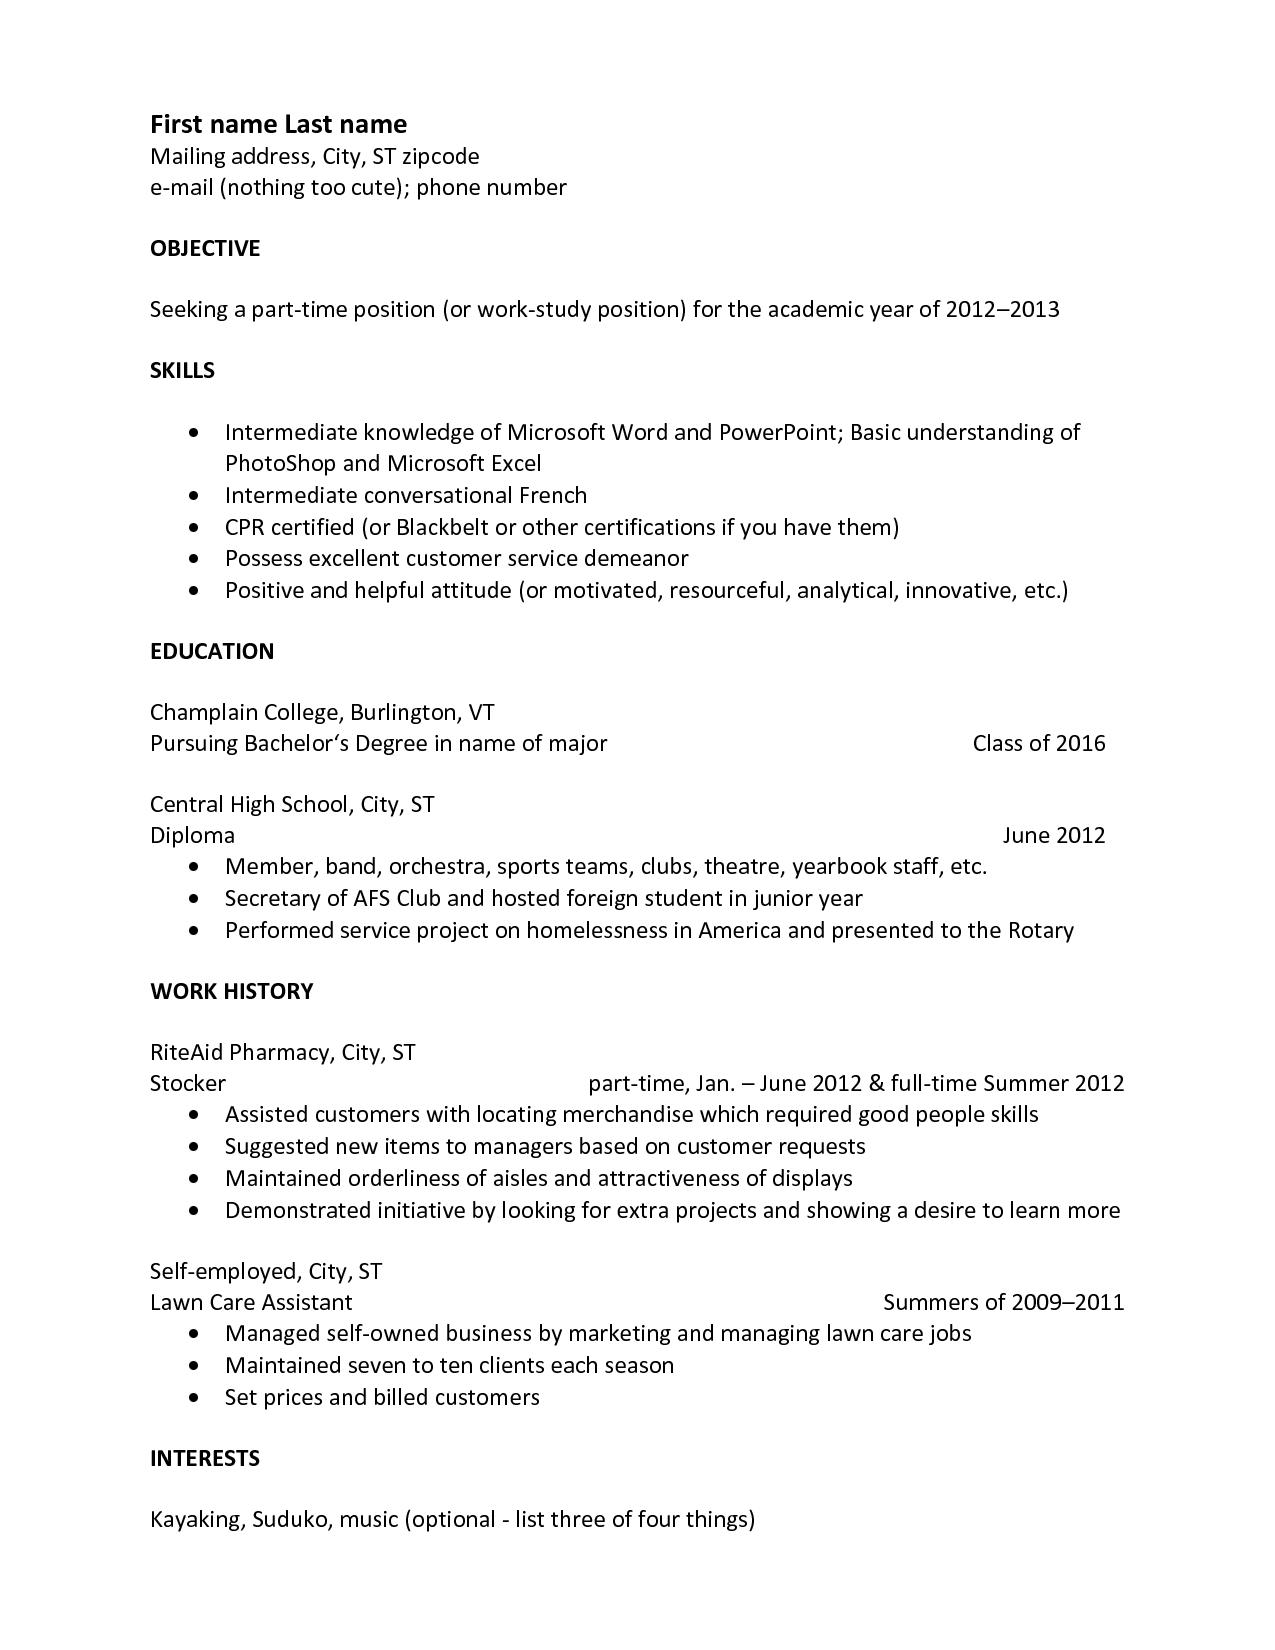 Acting Resume Beginner Samples http//www.resumecareer